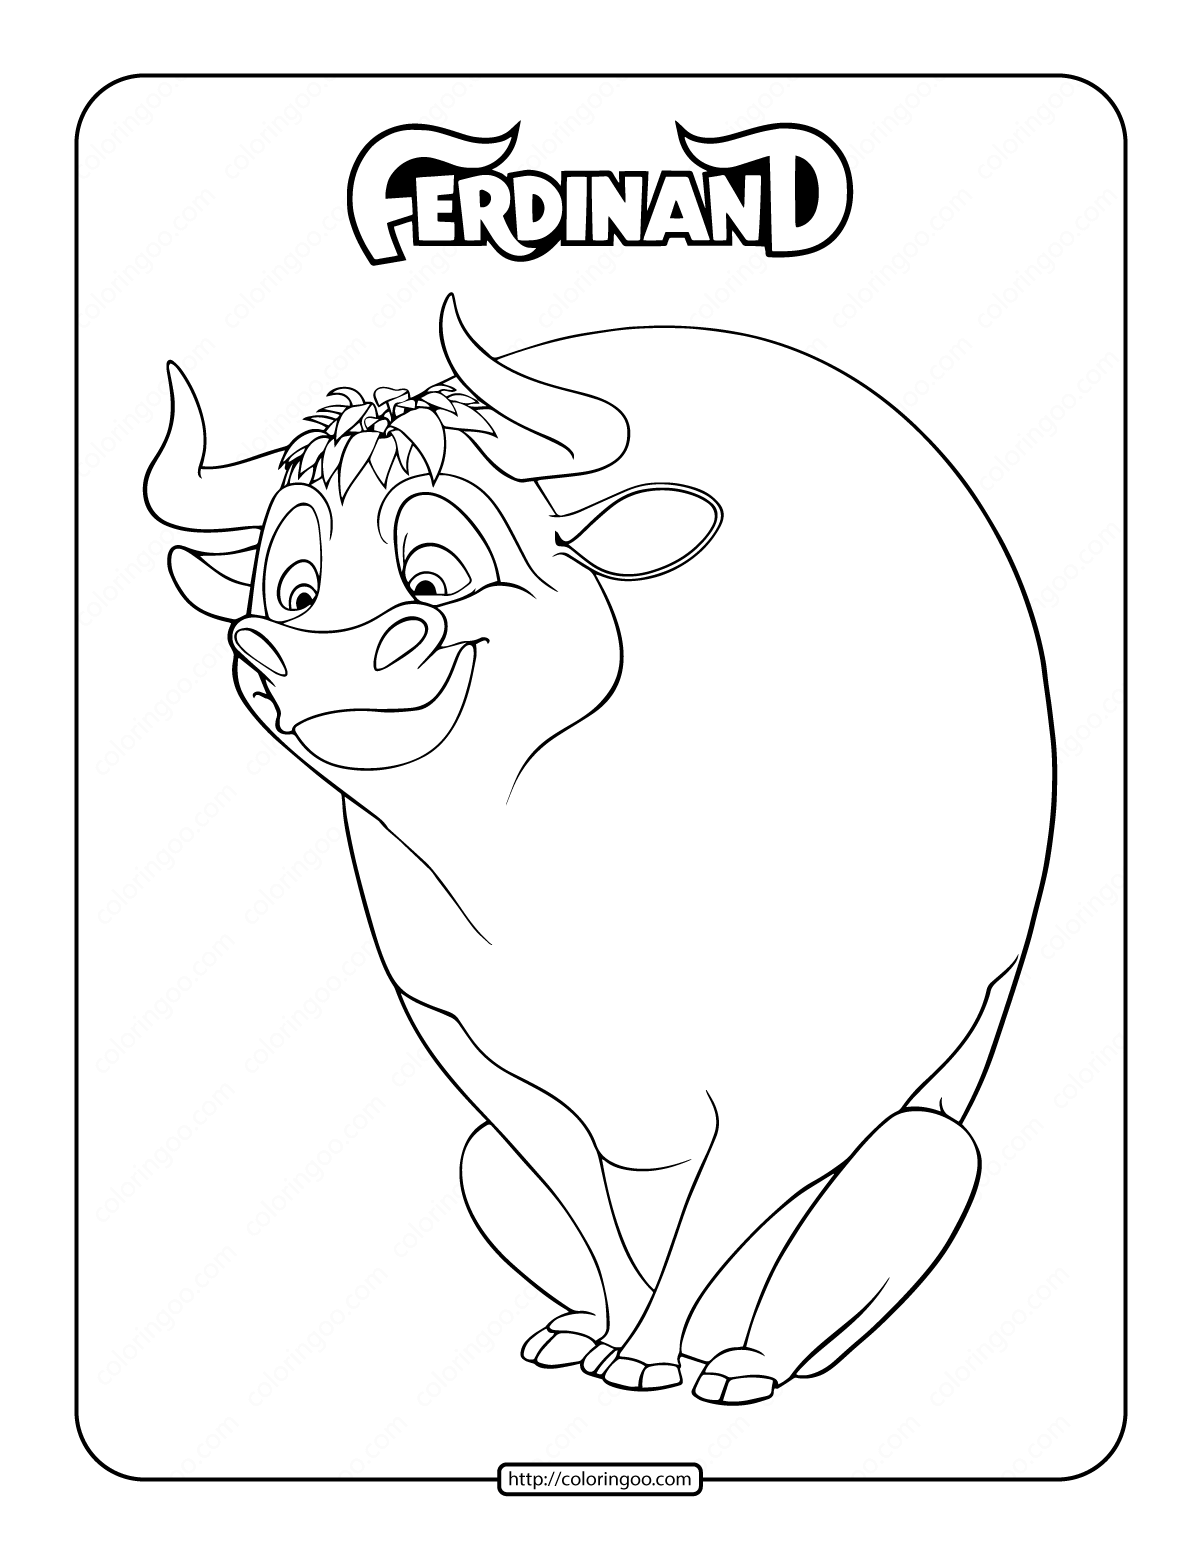 Ferdinand Coloring Page